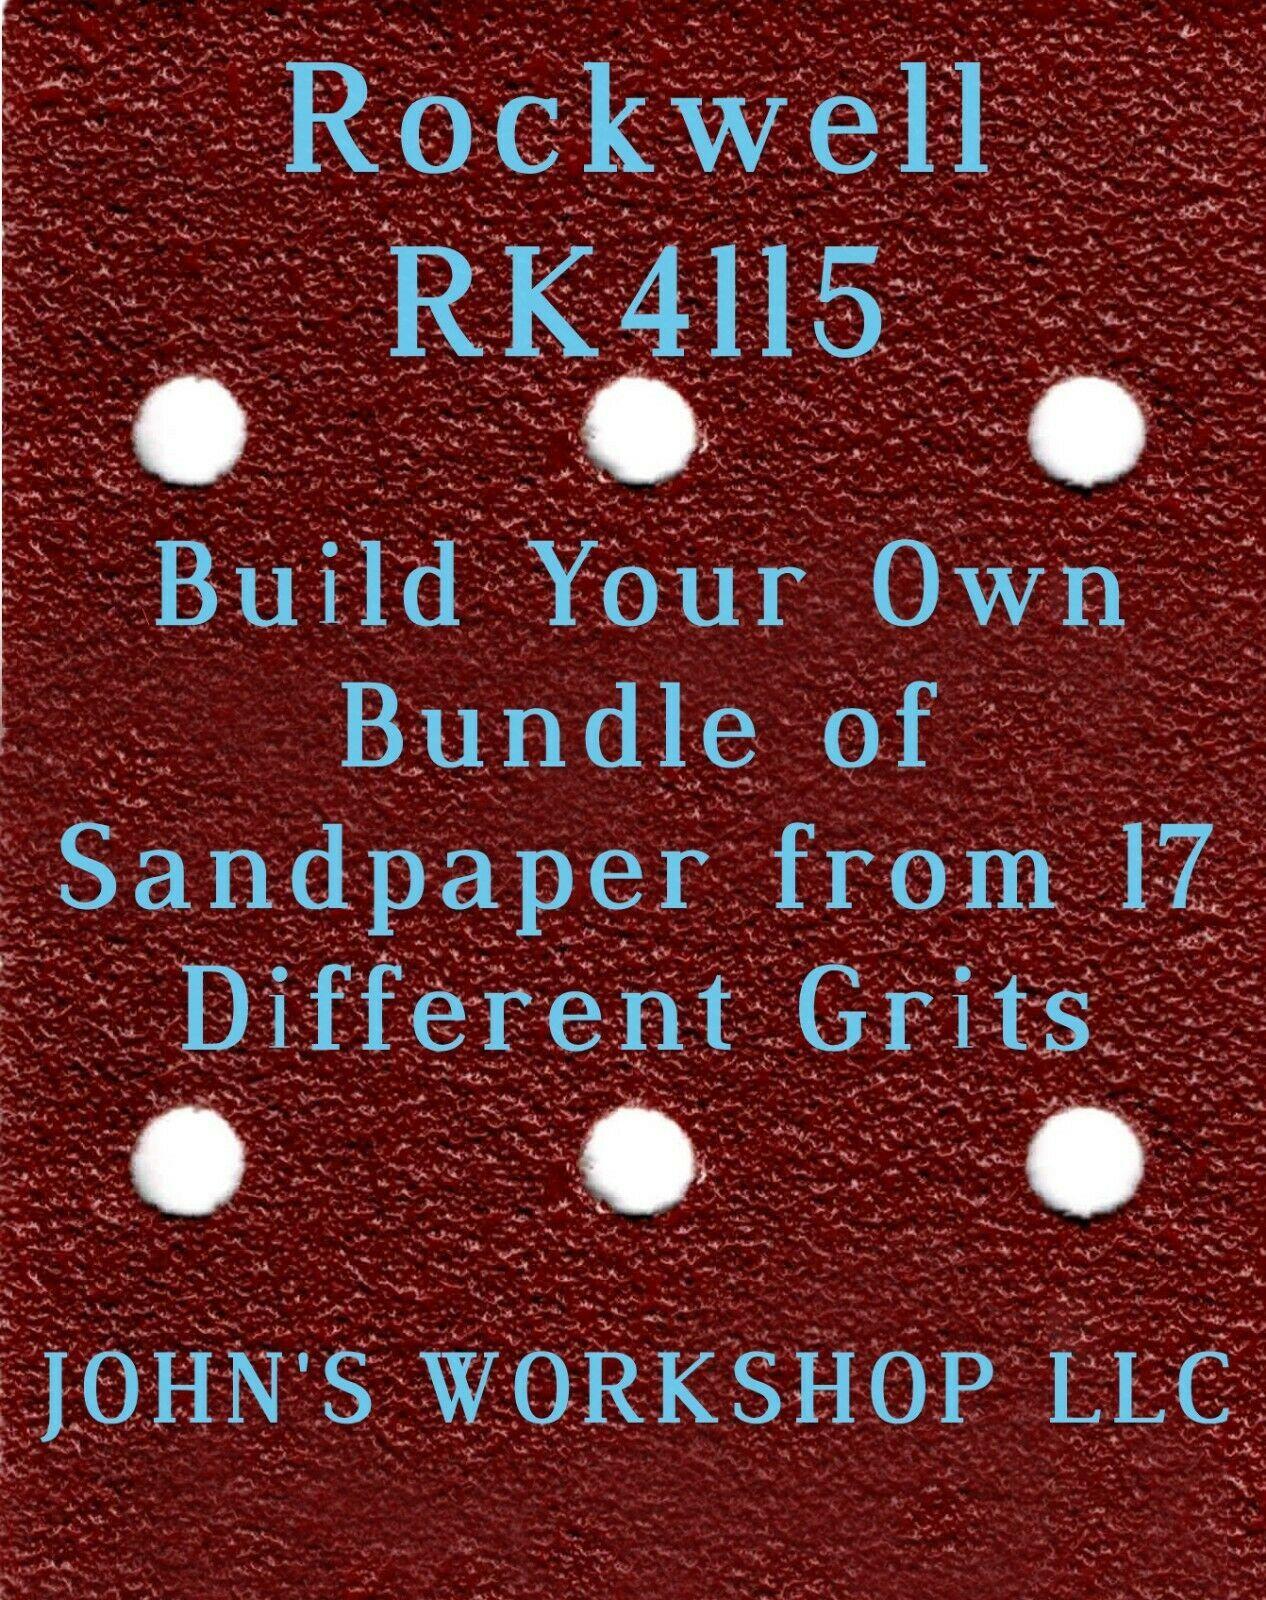 Build Your Own Bundle of Rockwell RK4115 1/4 Sheet No-Slip Sandpaper - 17 Grits - $0.99